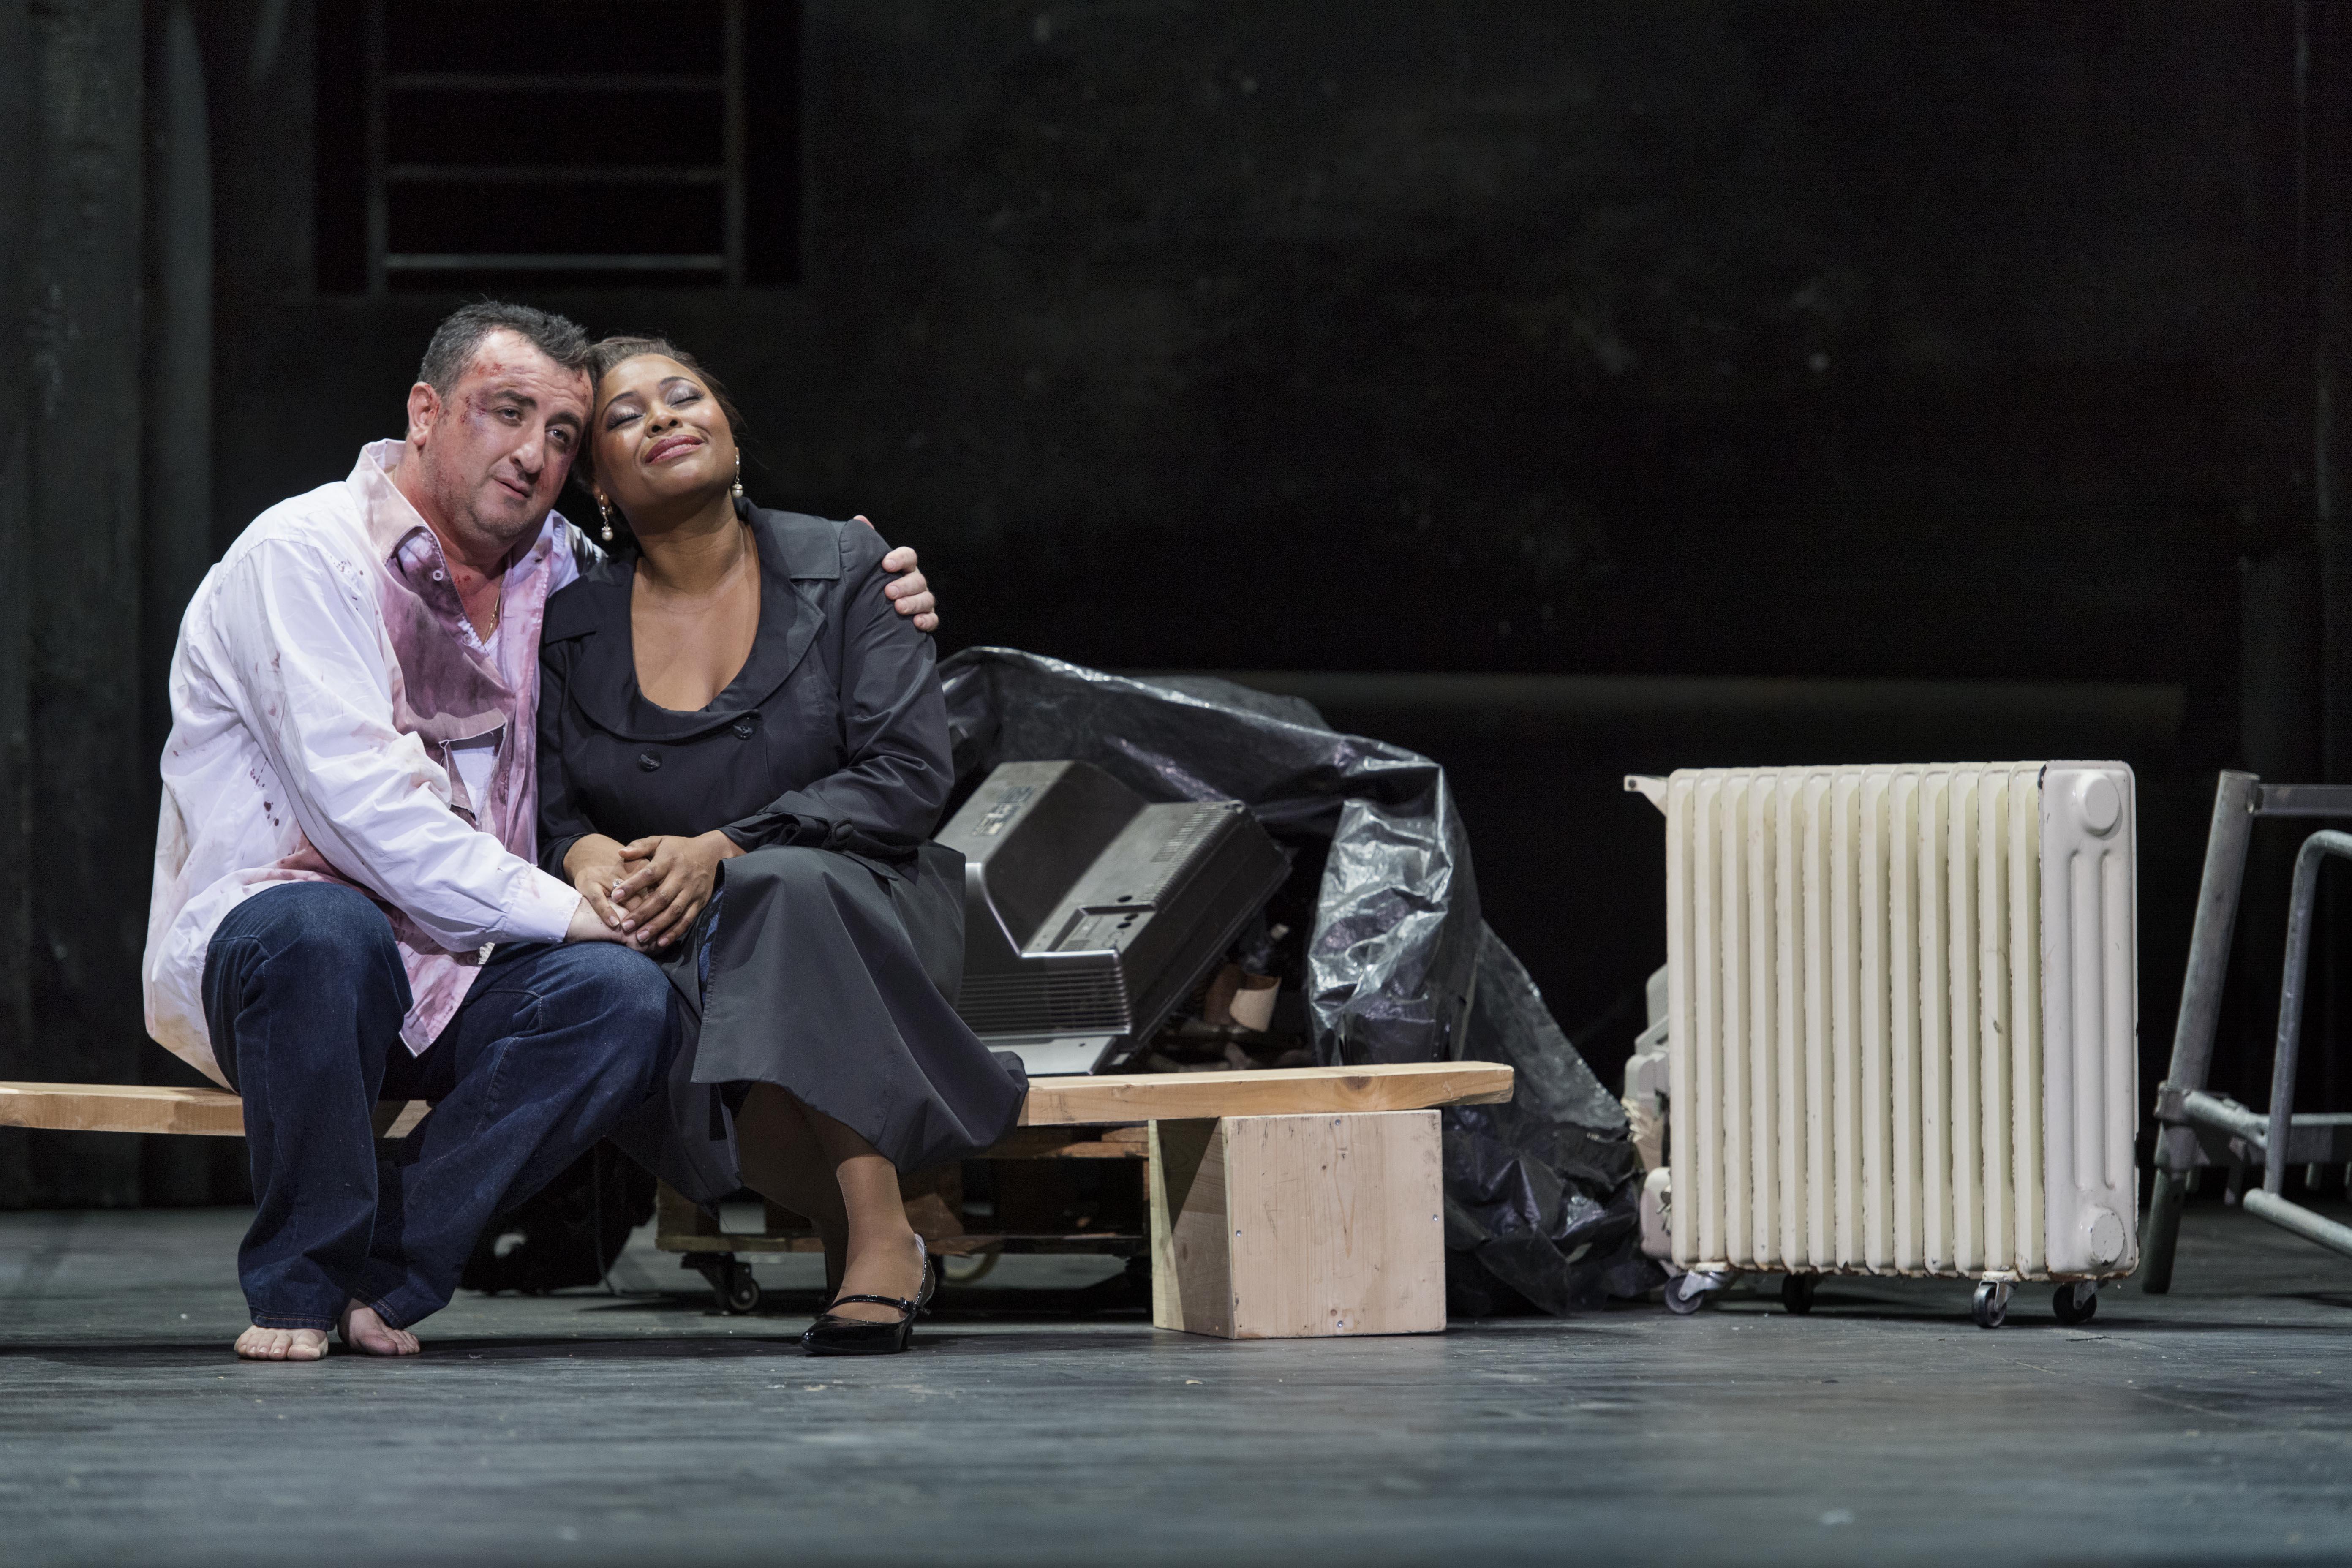 Bild: Thilo Beu | George Oniani & Yannick-Muriel Noah als CARAVADOSSI & TOSCA